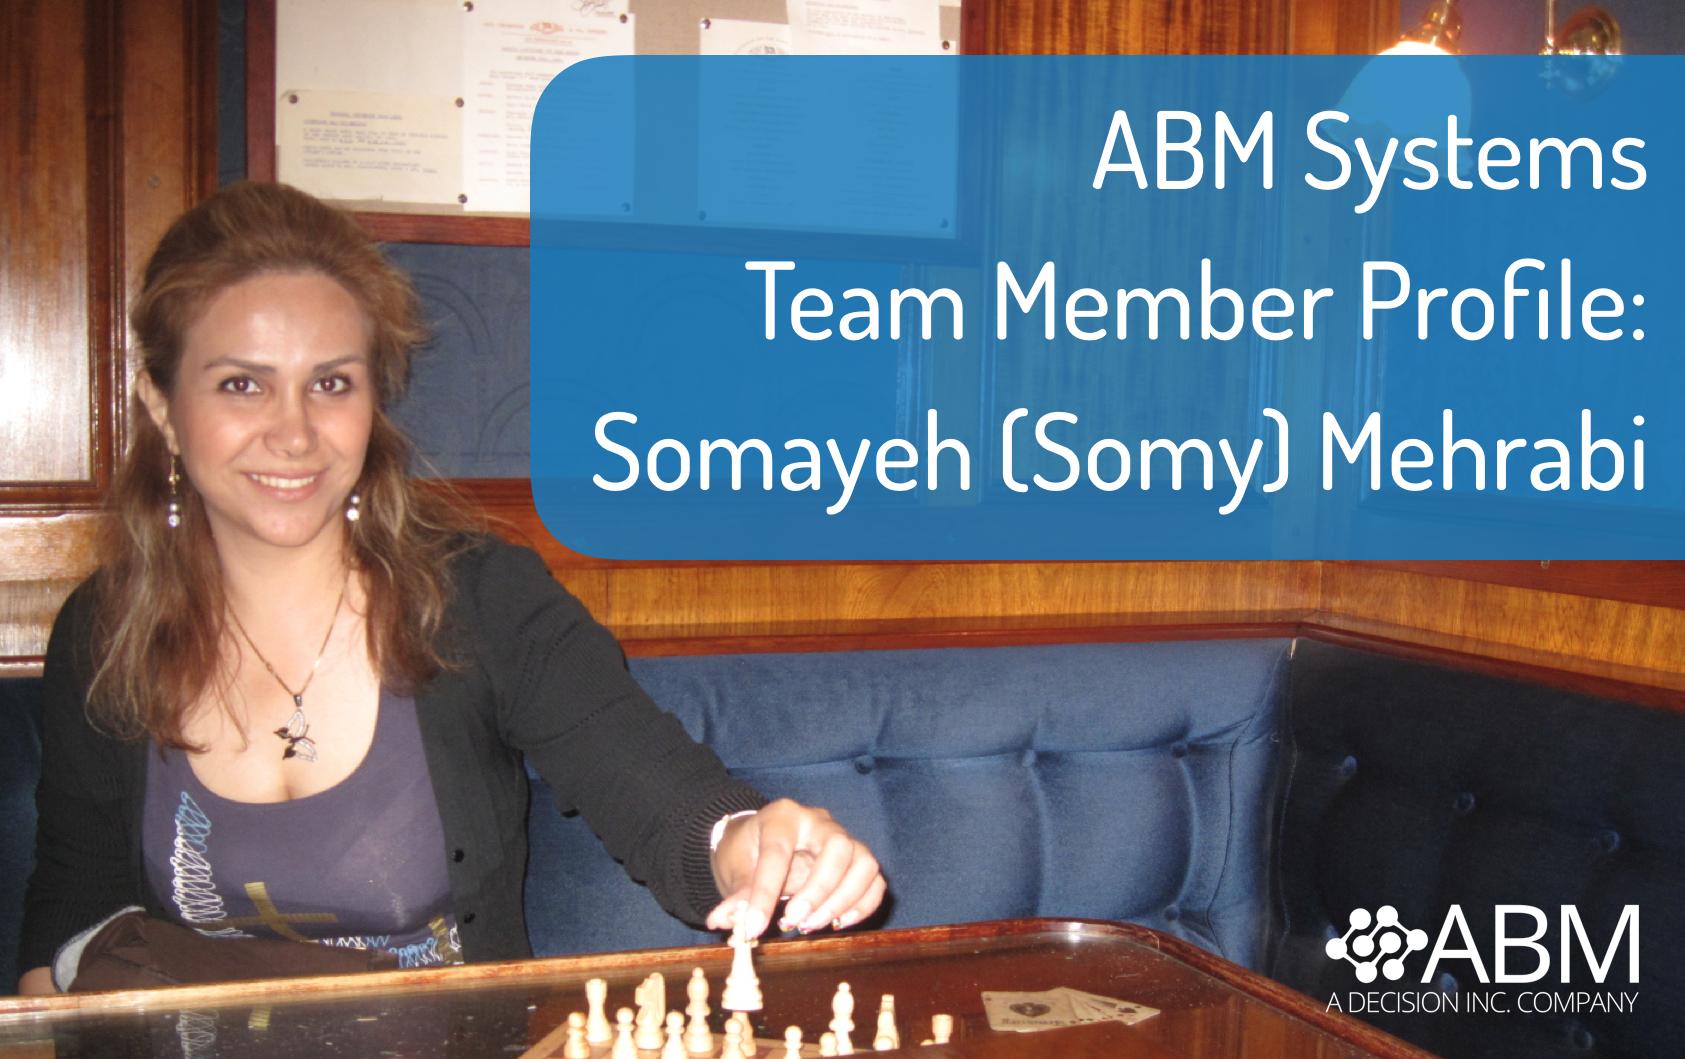 ABM Systems Team Member Profile: Somayeh (Somy) Mehrabi